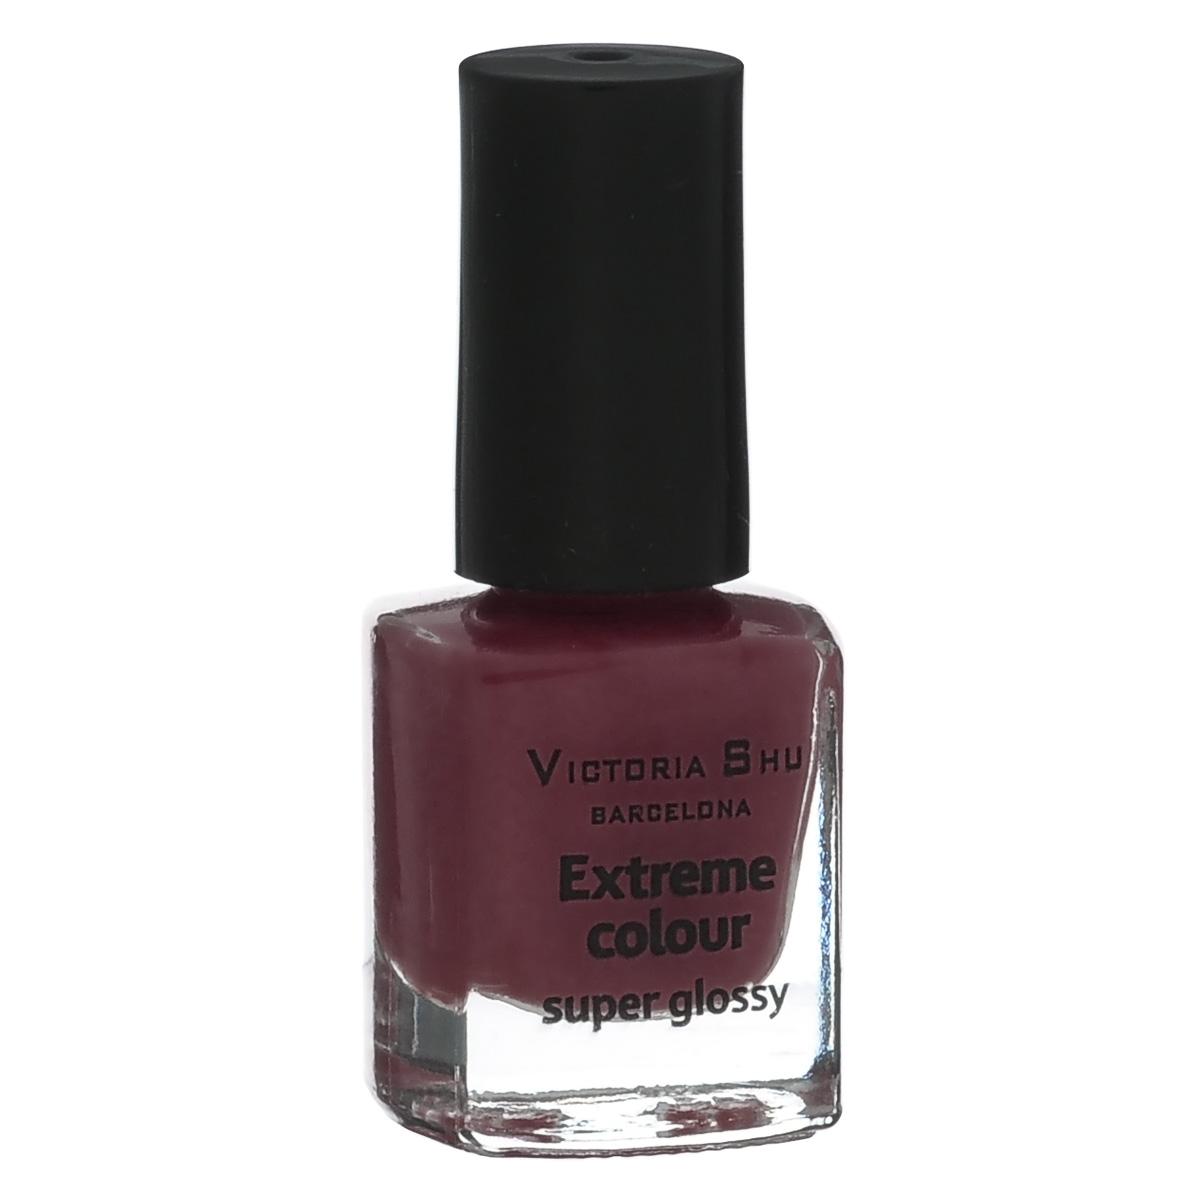 Victoria Shu Лак для ногтей Extreme Colour, тон № 267, 6 мл лаки для ногтей victoria shu лак для ногтей extreme colour 221